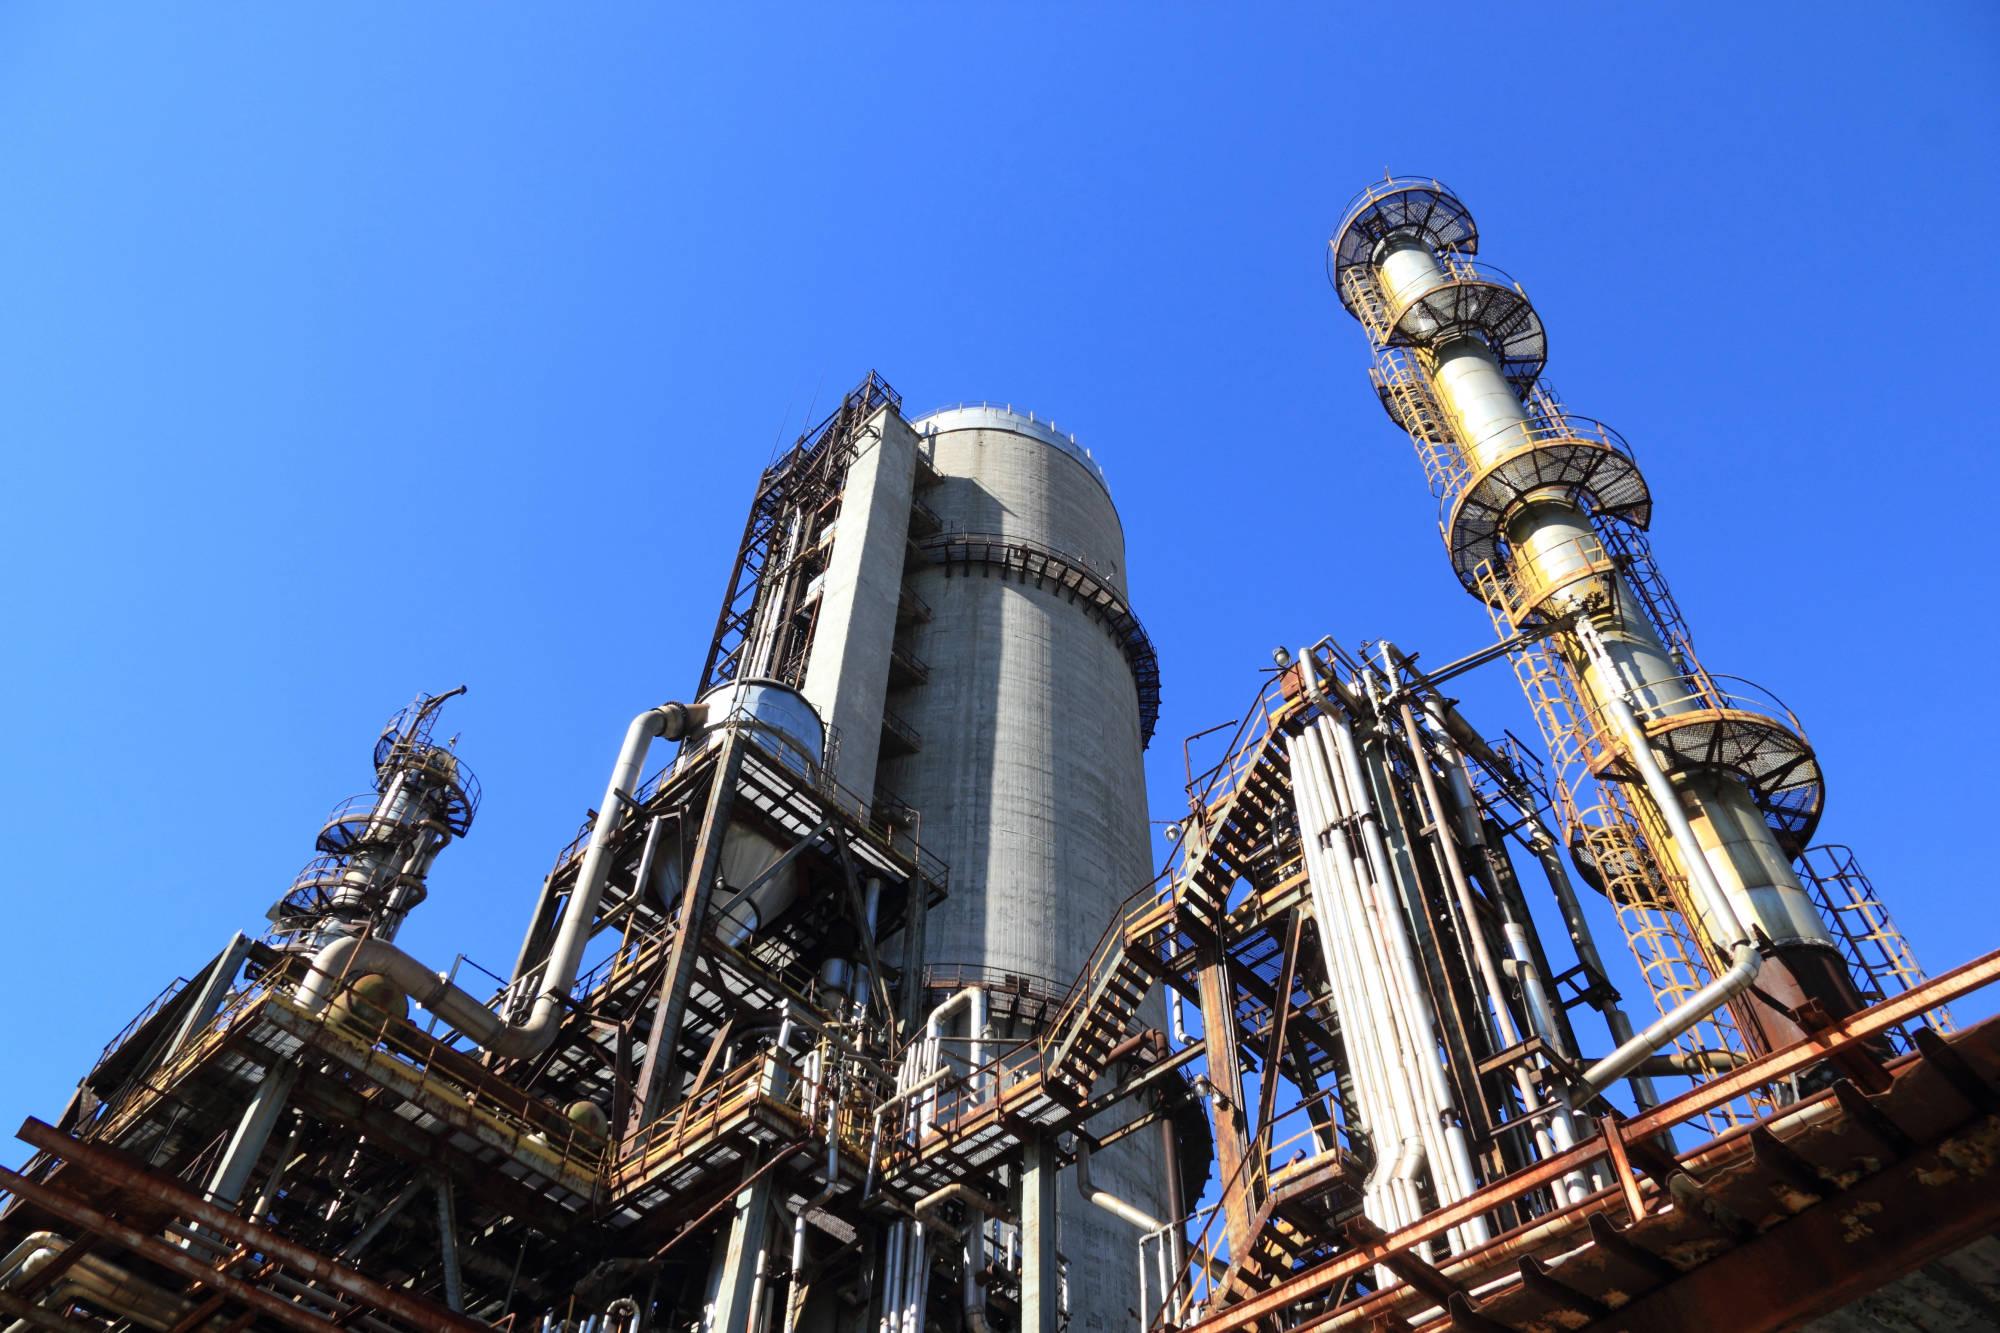 Vertex Energy (VTNR) Breakout Alert: How to Trade This Week?